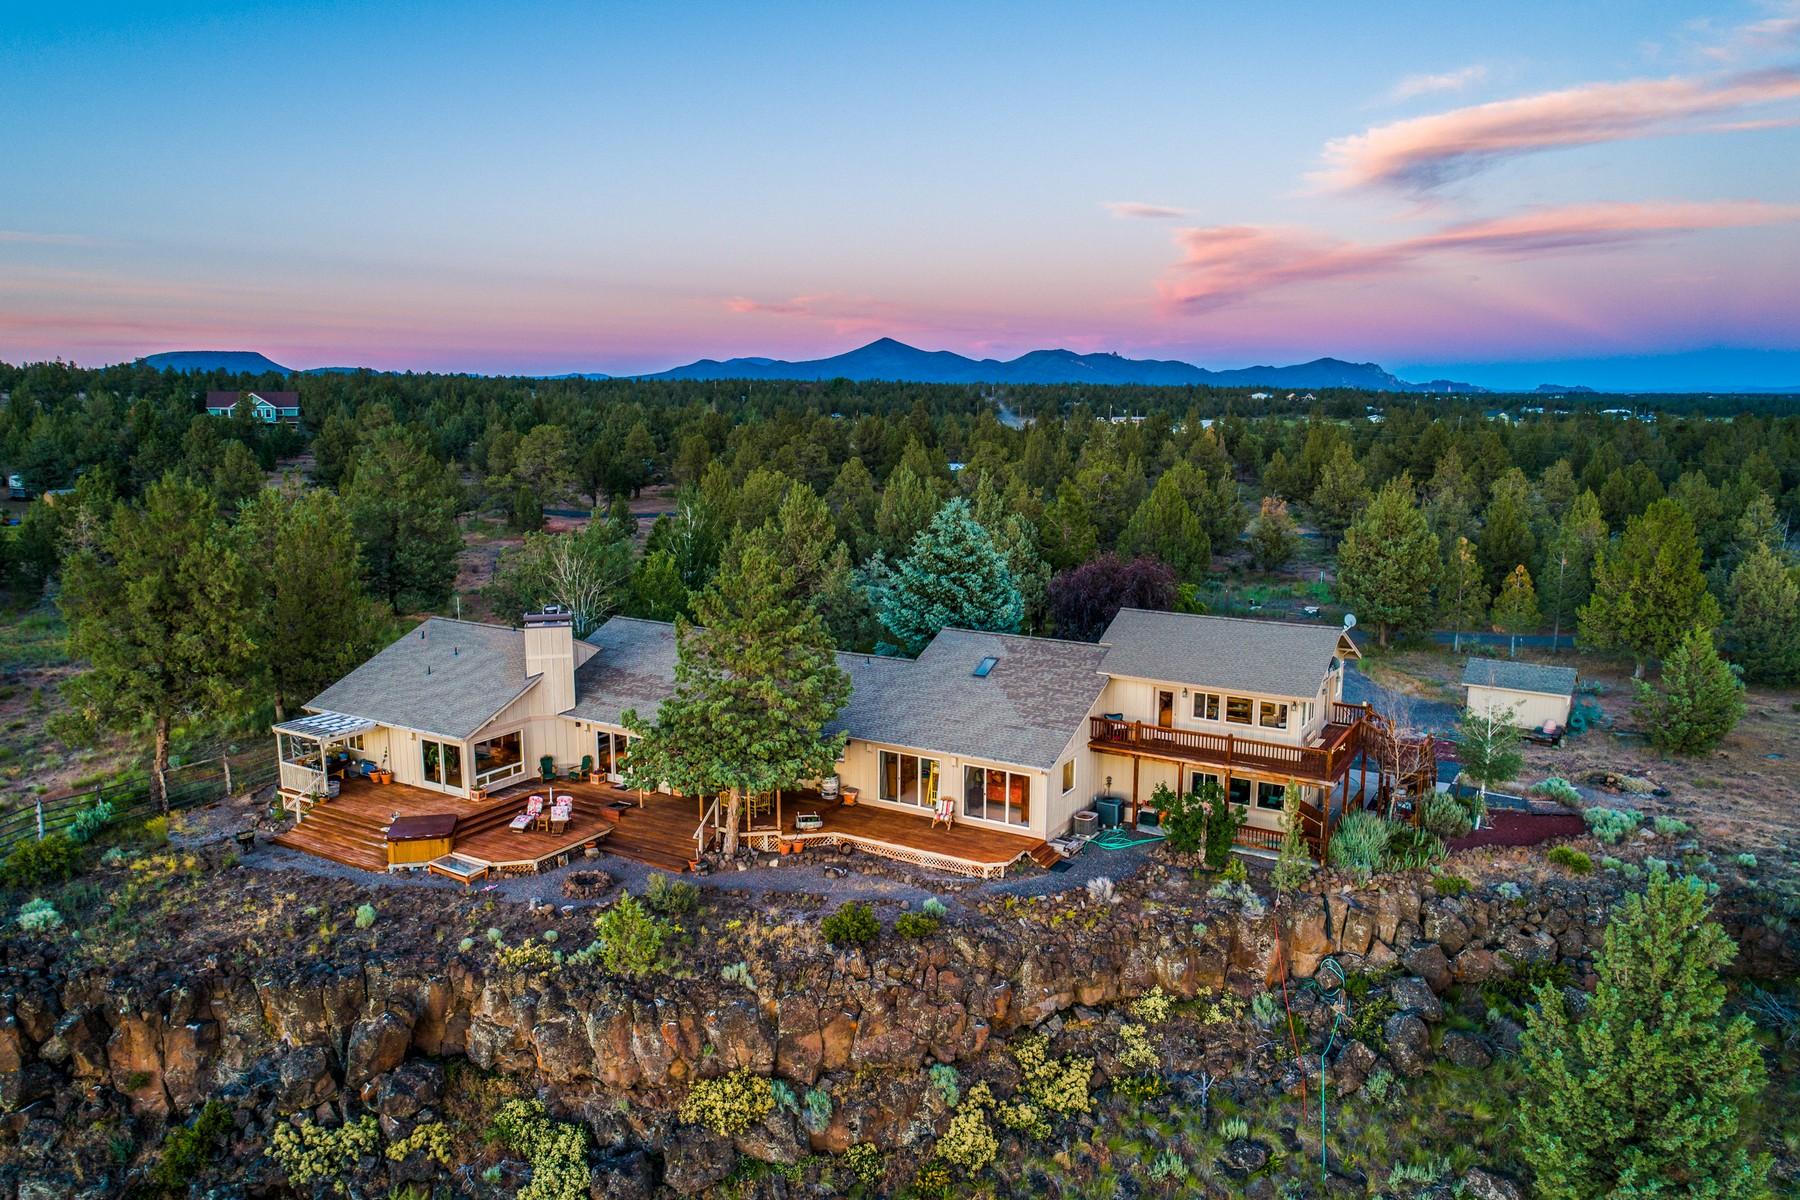 Other Residential Homes για την Πώληση στο 7762 SW Robin Drive Terrebonne, OR 97760 Terrebonne, Ορεγκον 97760 Ηνωμένες Πολιτείες